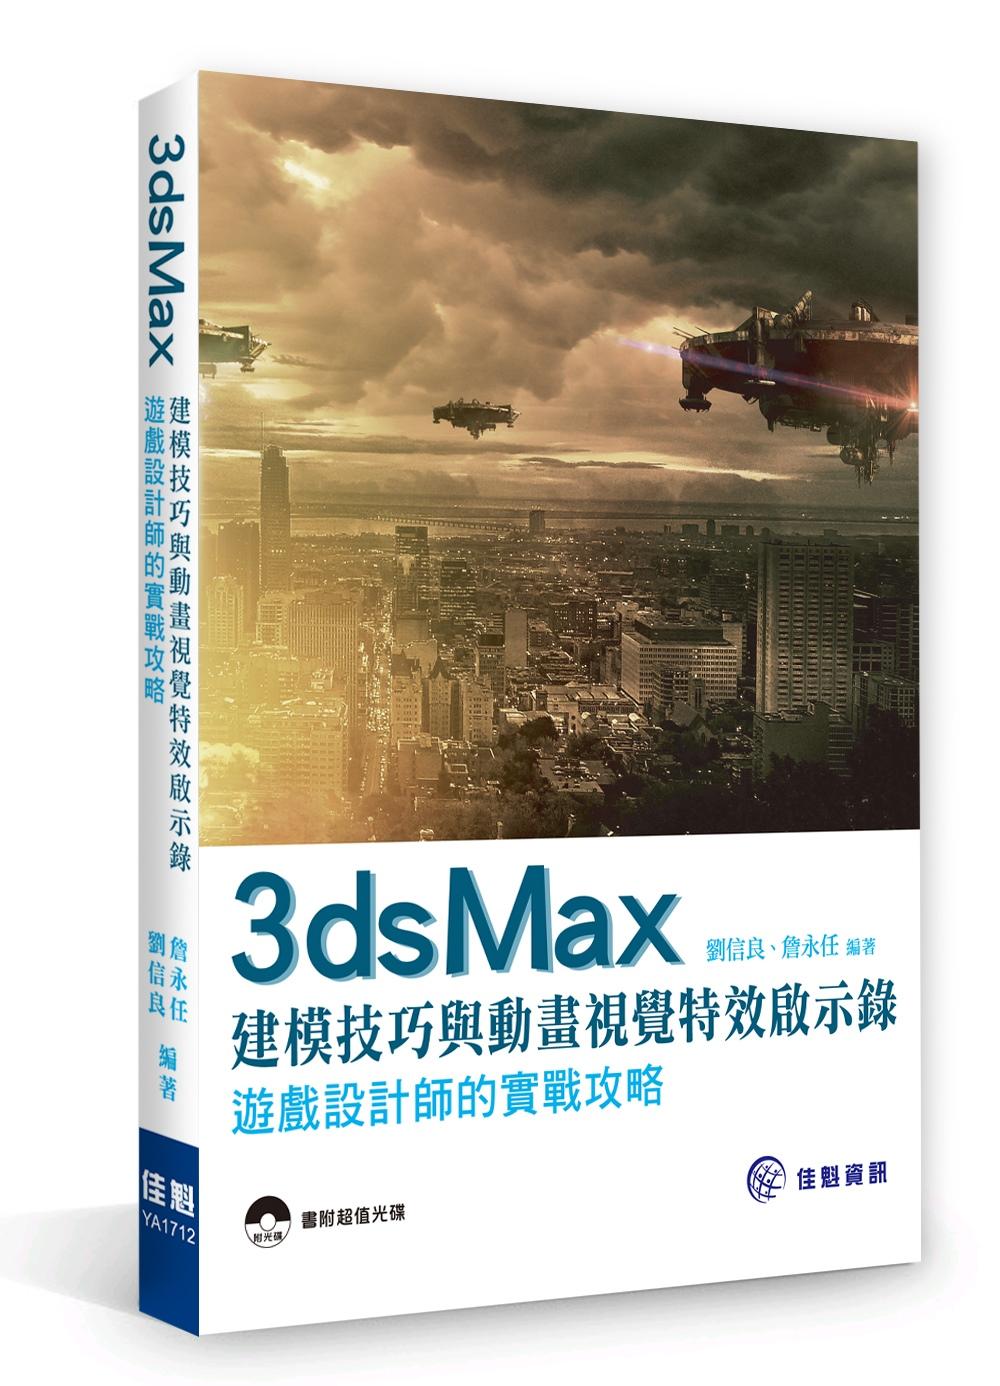 3ds Max 建模技巧與動畫視覺特效啟示錄:遊戲設計師的實戰攻略(附CD)